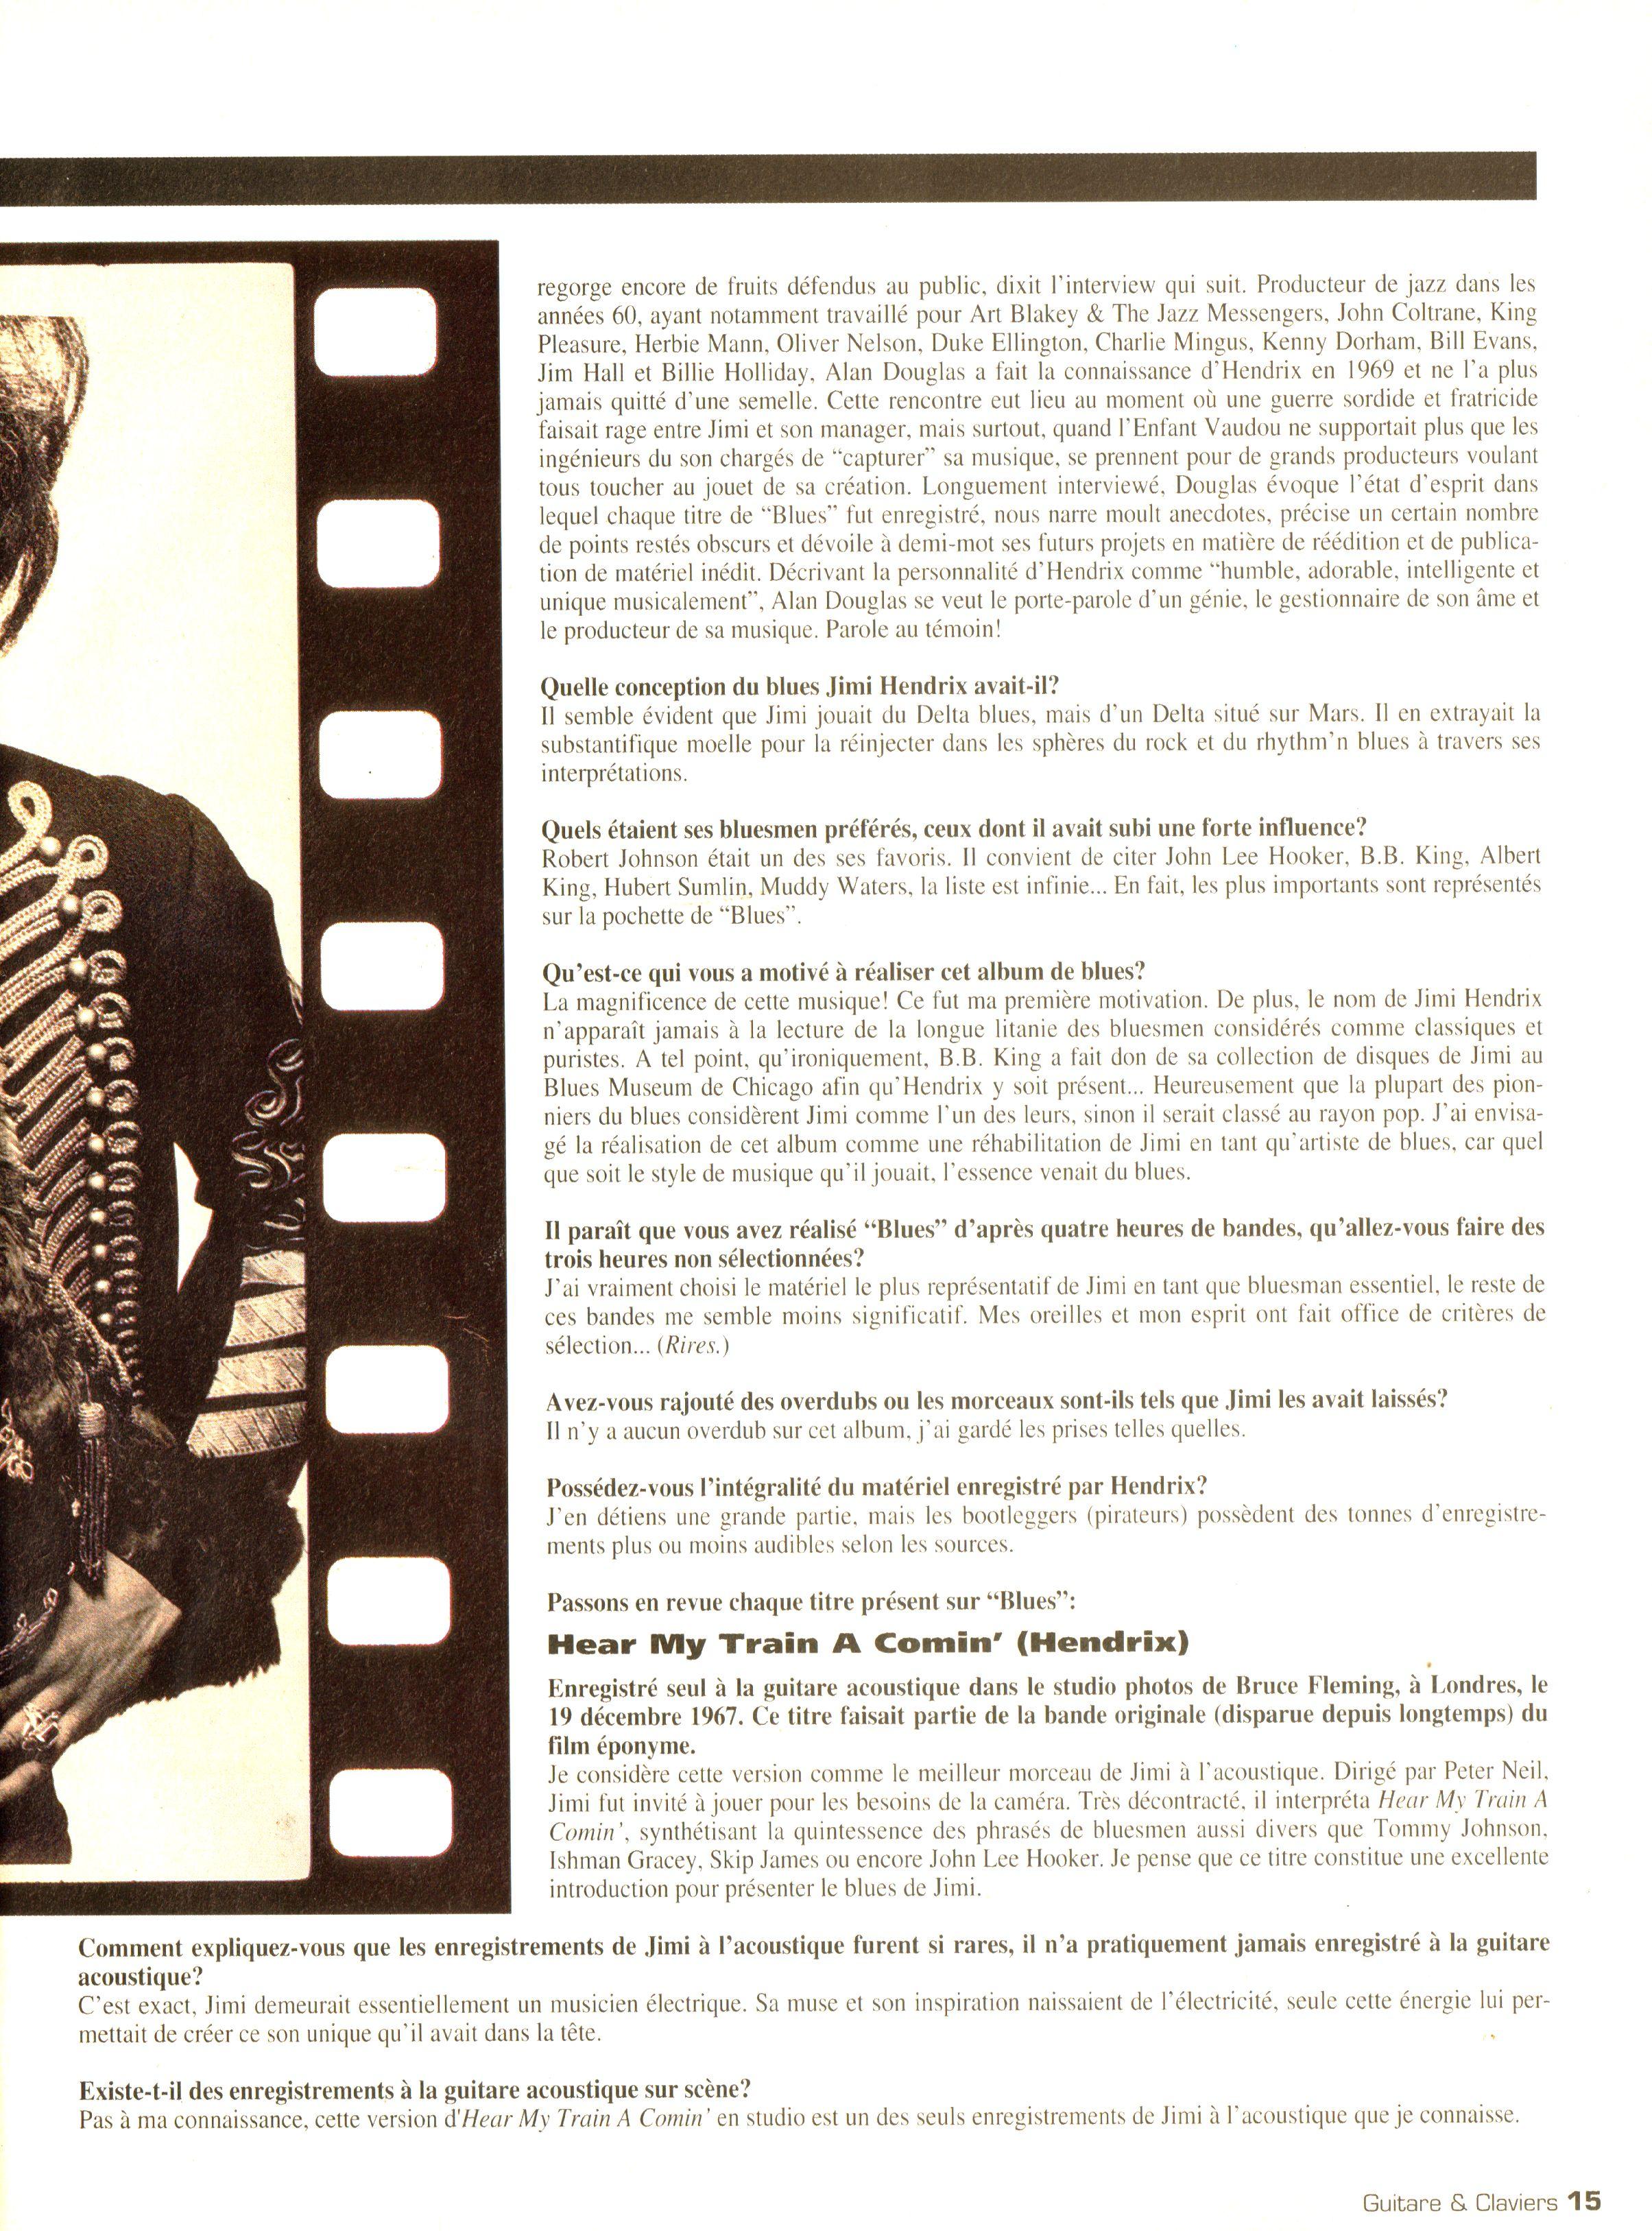 Magazines Français 1989 - 2014 GuitaretClavierAvril1994Page15